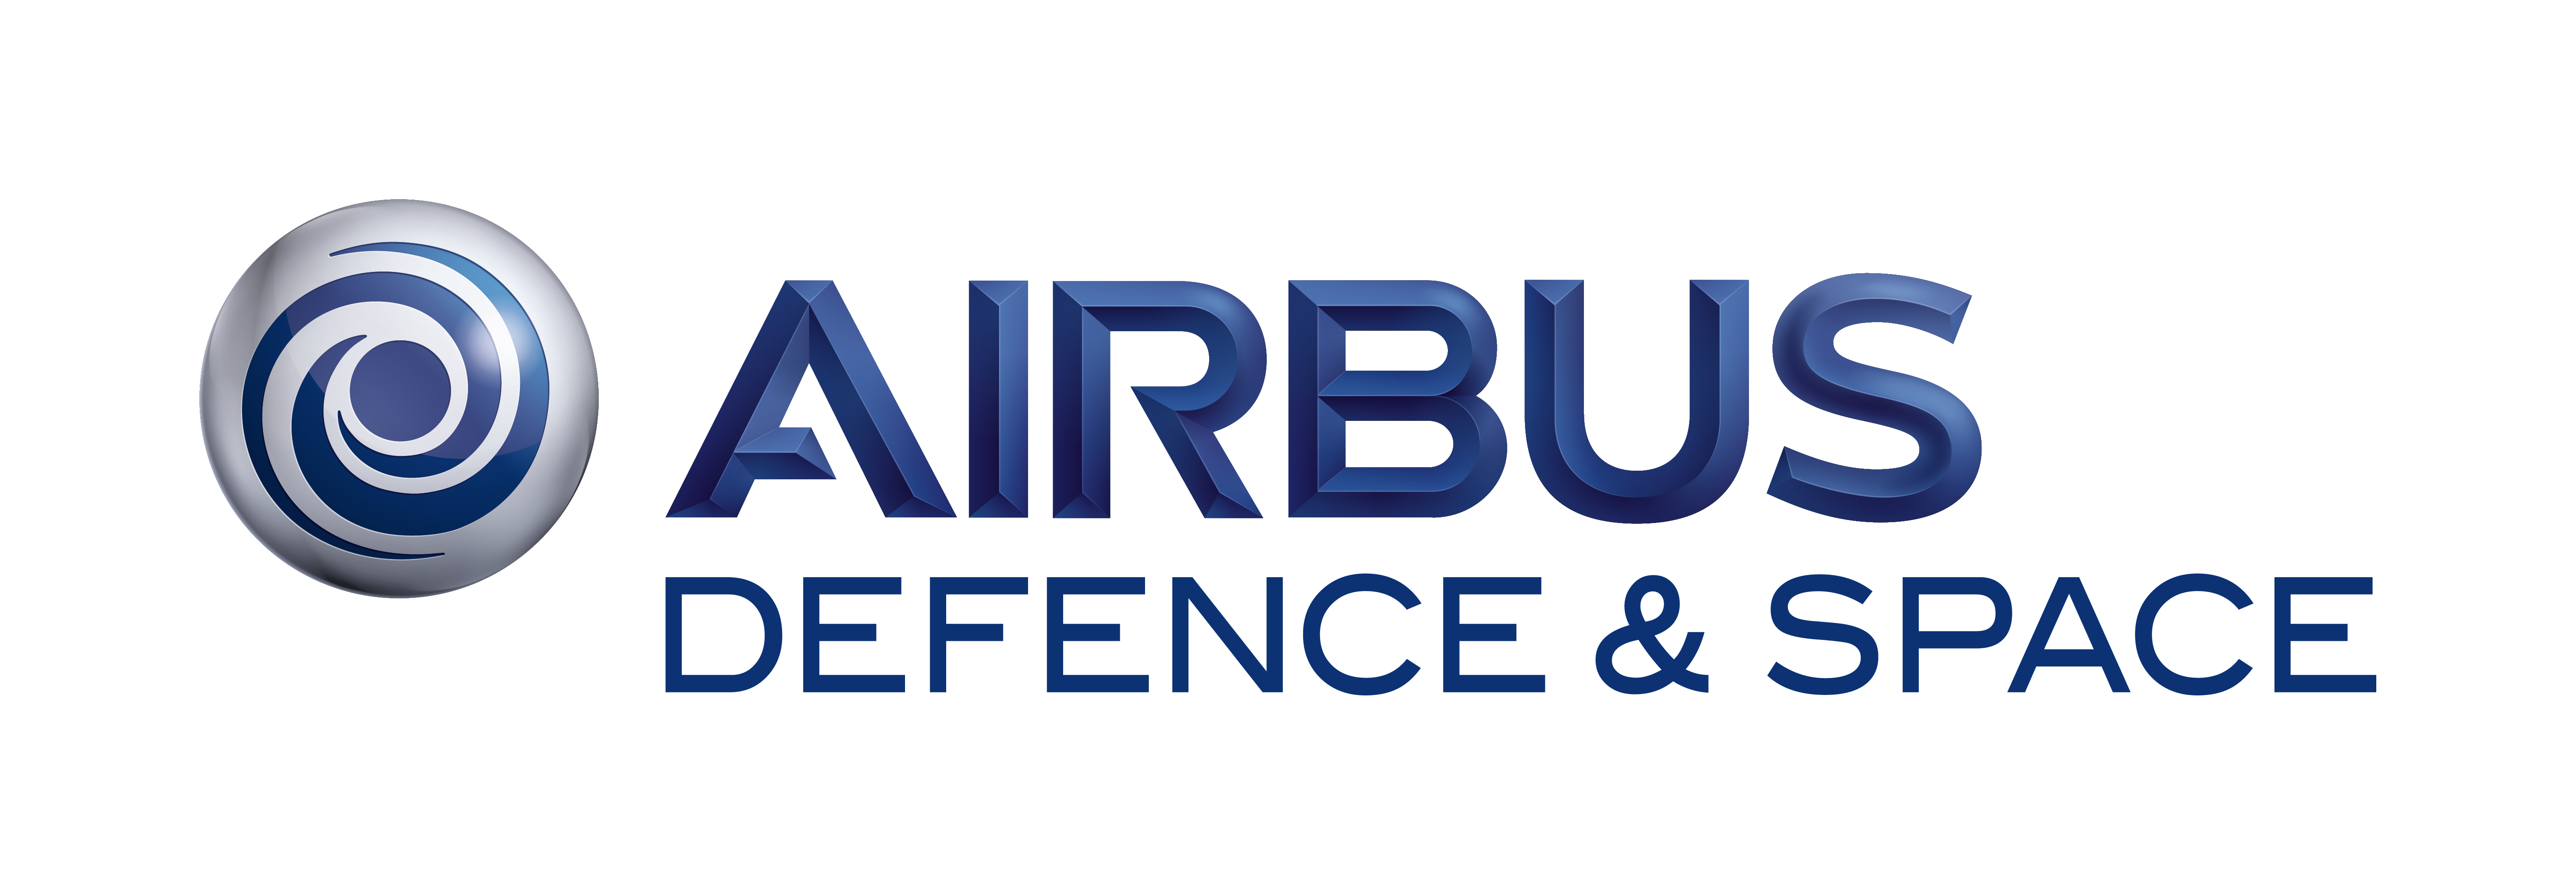 Airbus PNG - 7319